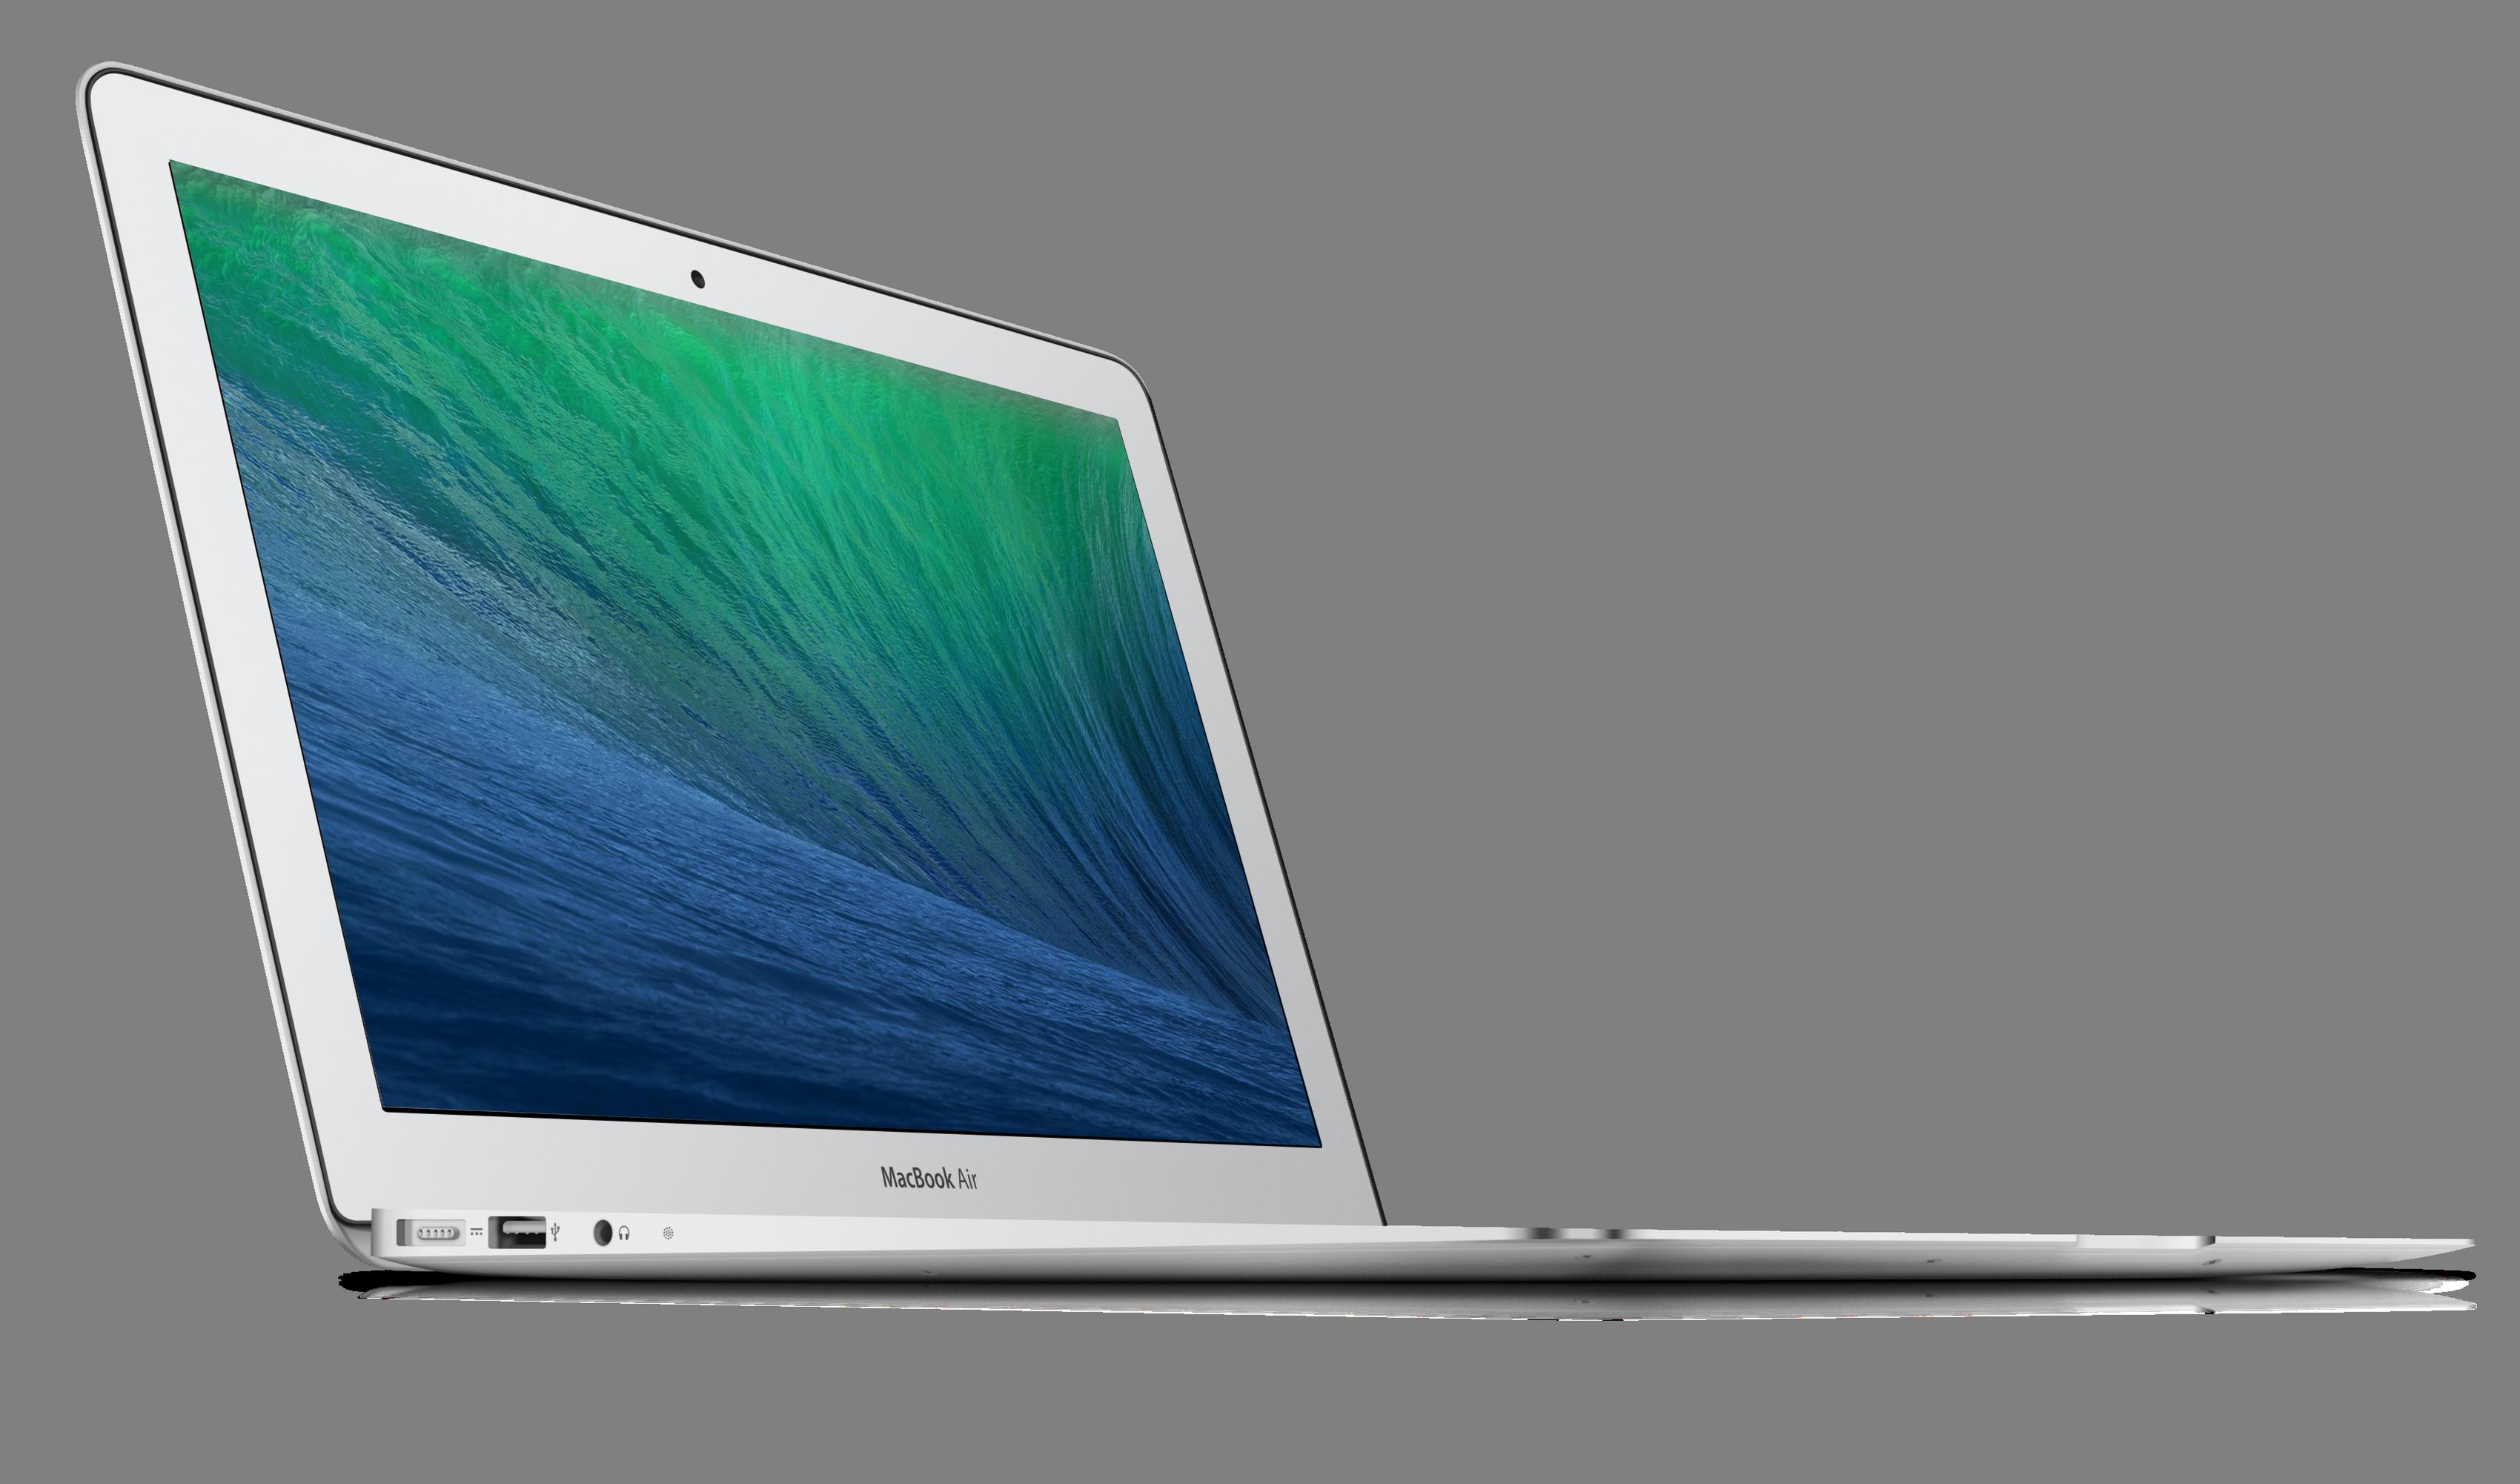 Macbook Png Image Macbook Apple Macbook Apple Laptop